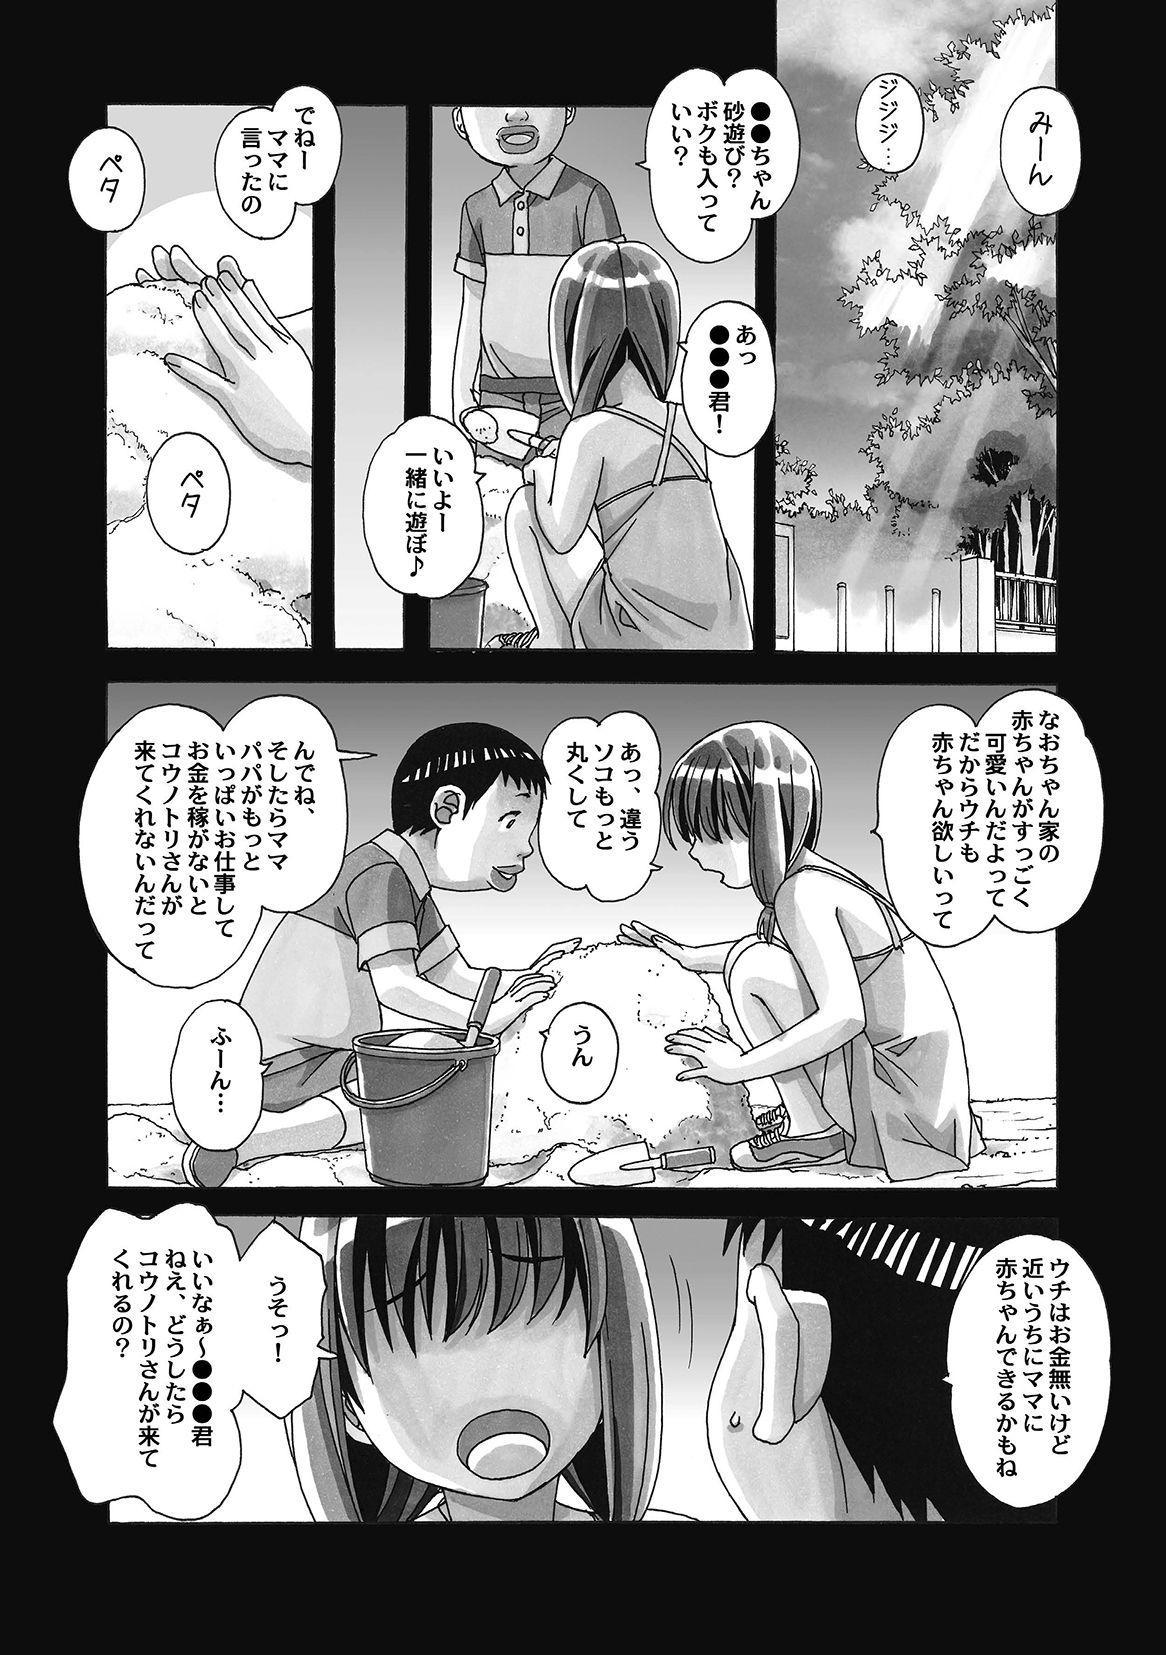 Nana Sakubougetsu - NANA of the childhood friend 107